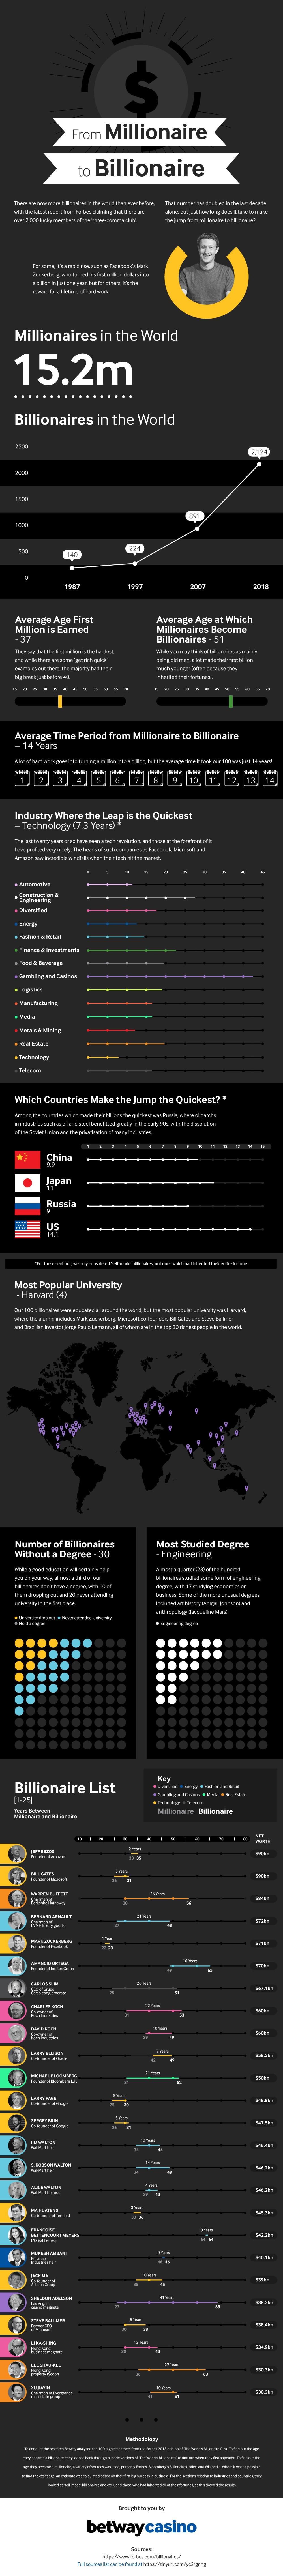 Millionaire To Billionaire [Infographic]